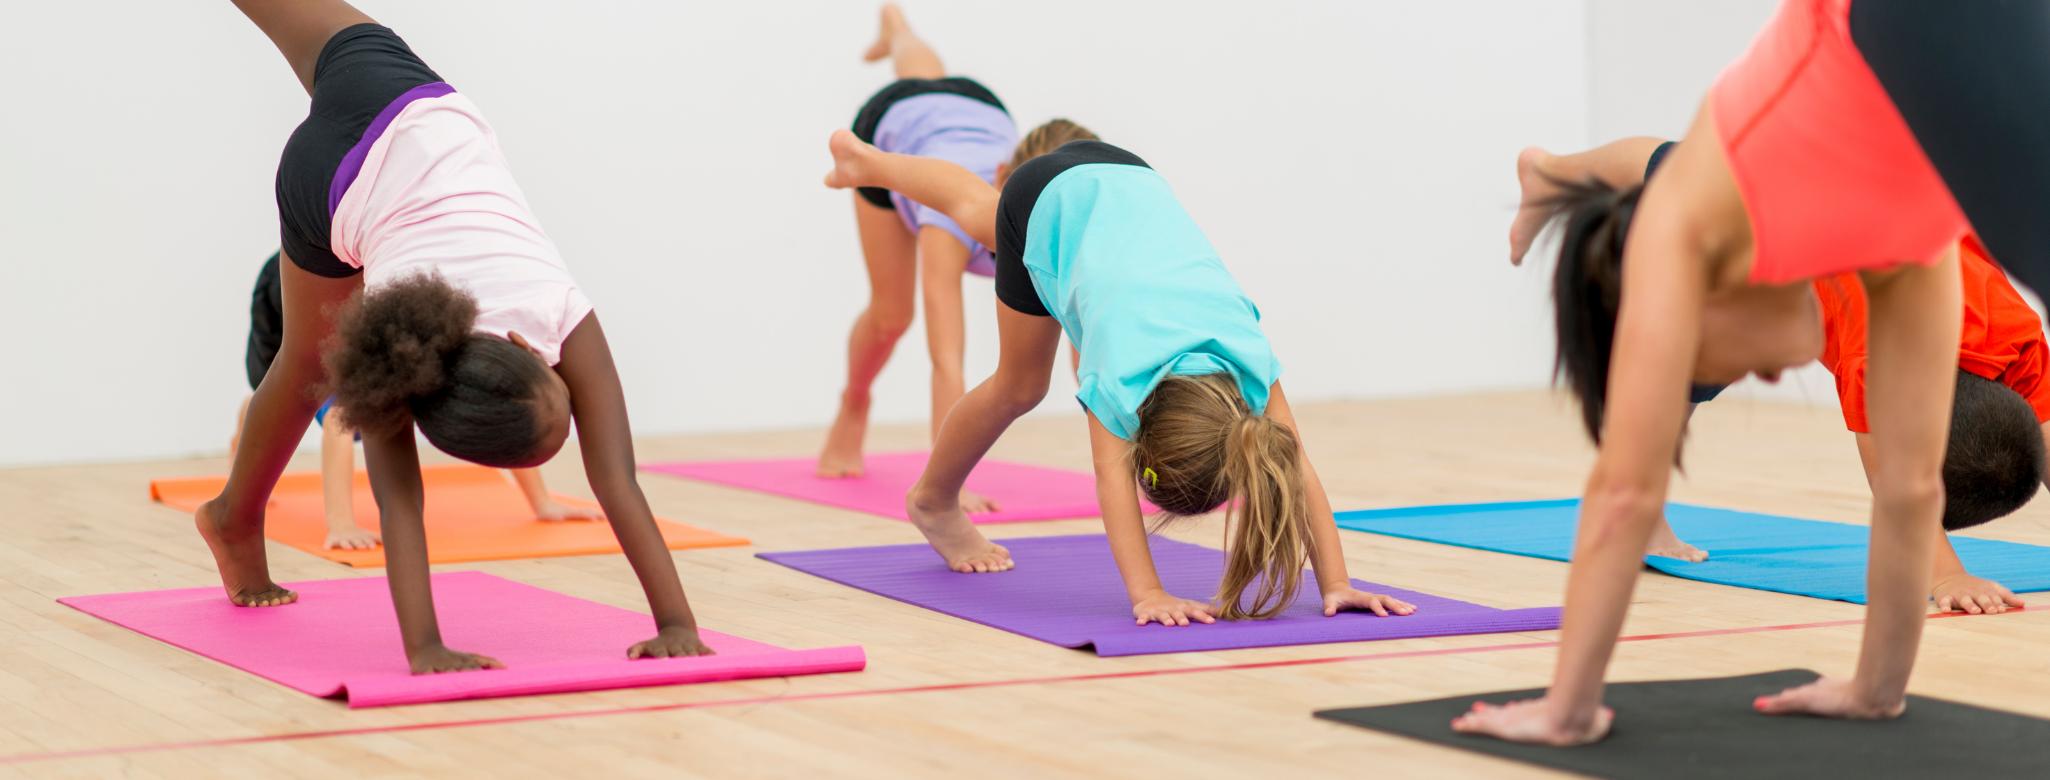 children practicing yoga on yoga mats